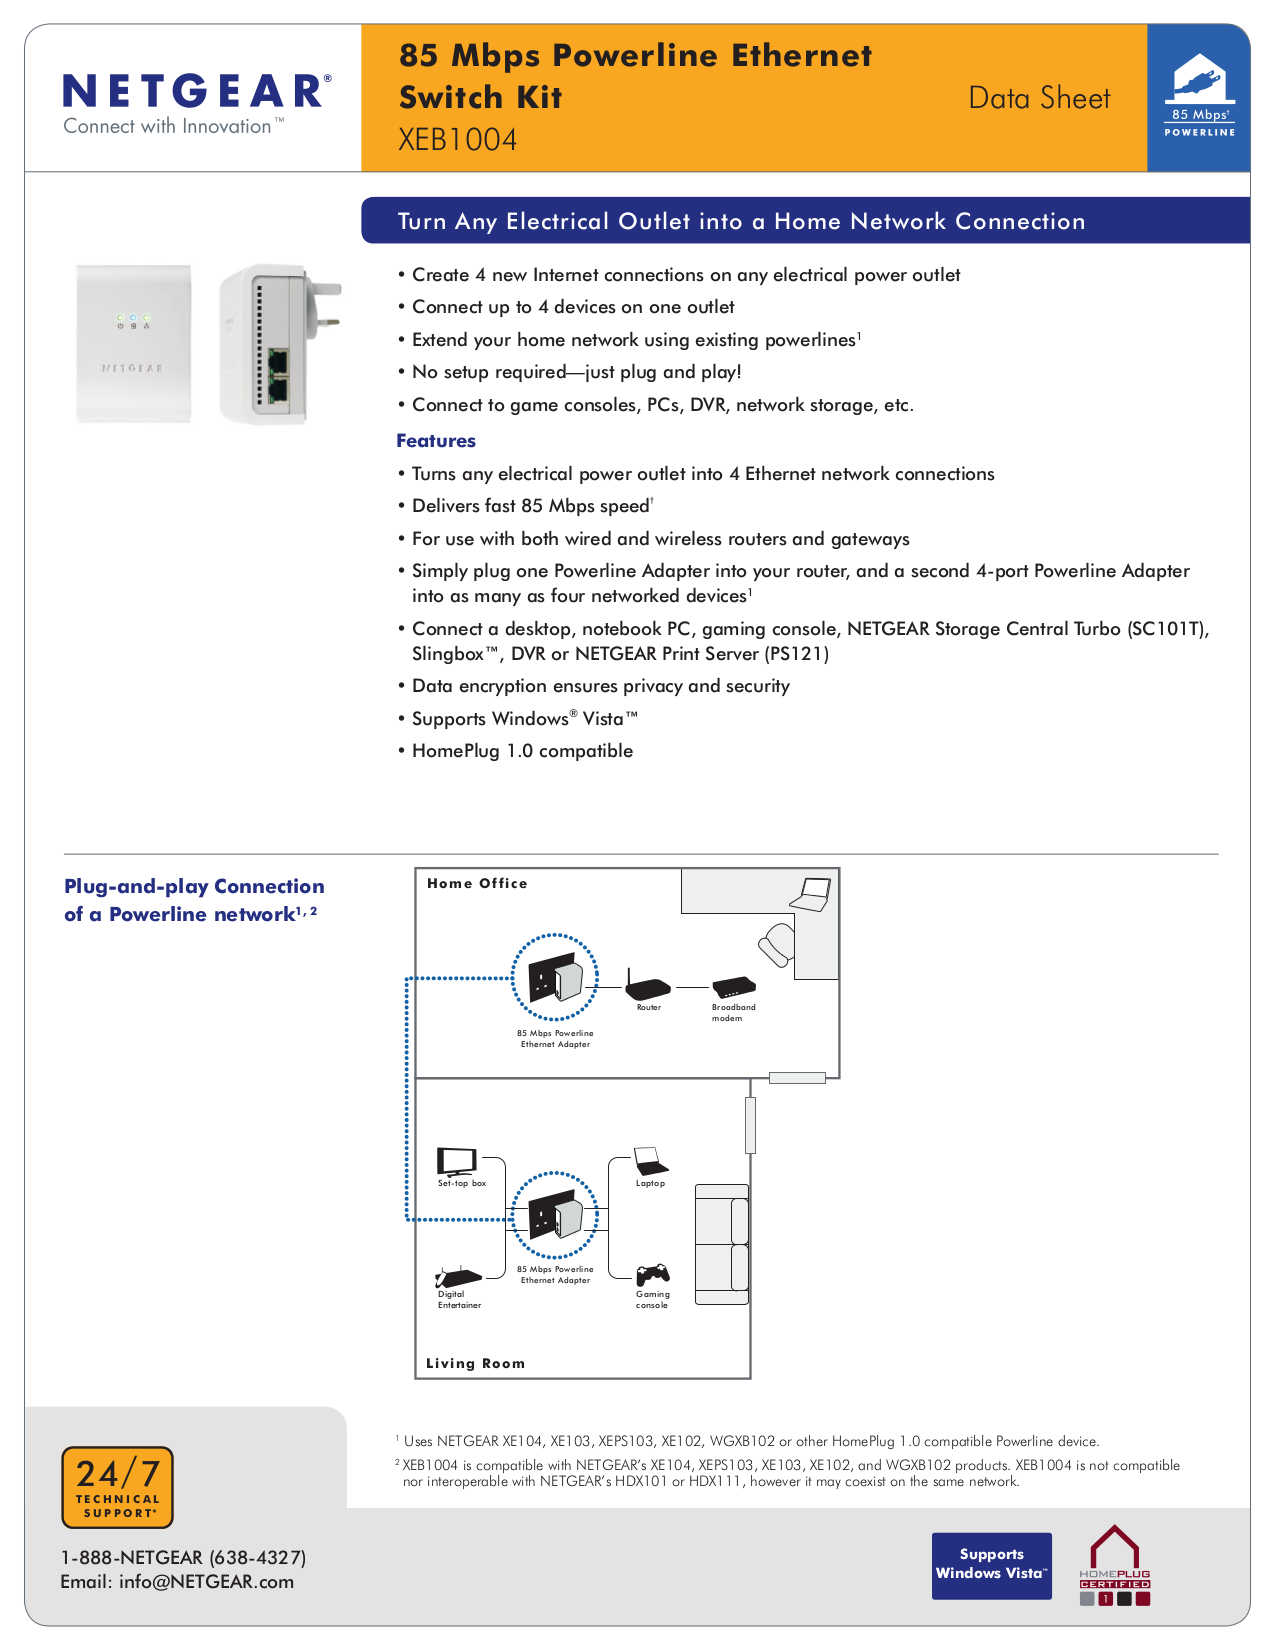 Netgear ps121 usb 2. 0 mini print server buy netgear ps121 usb.